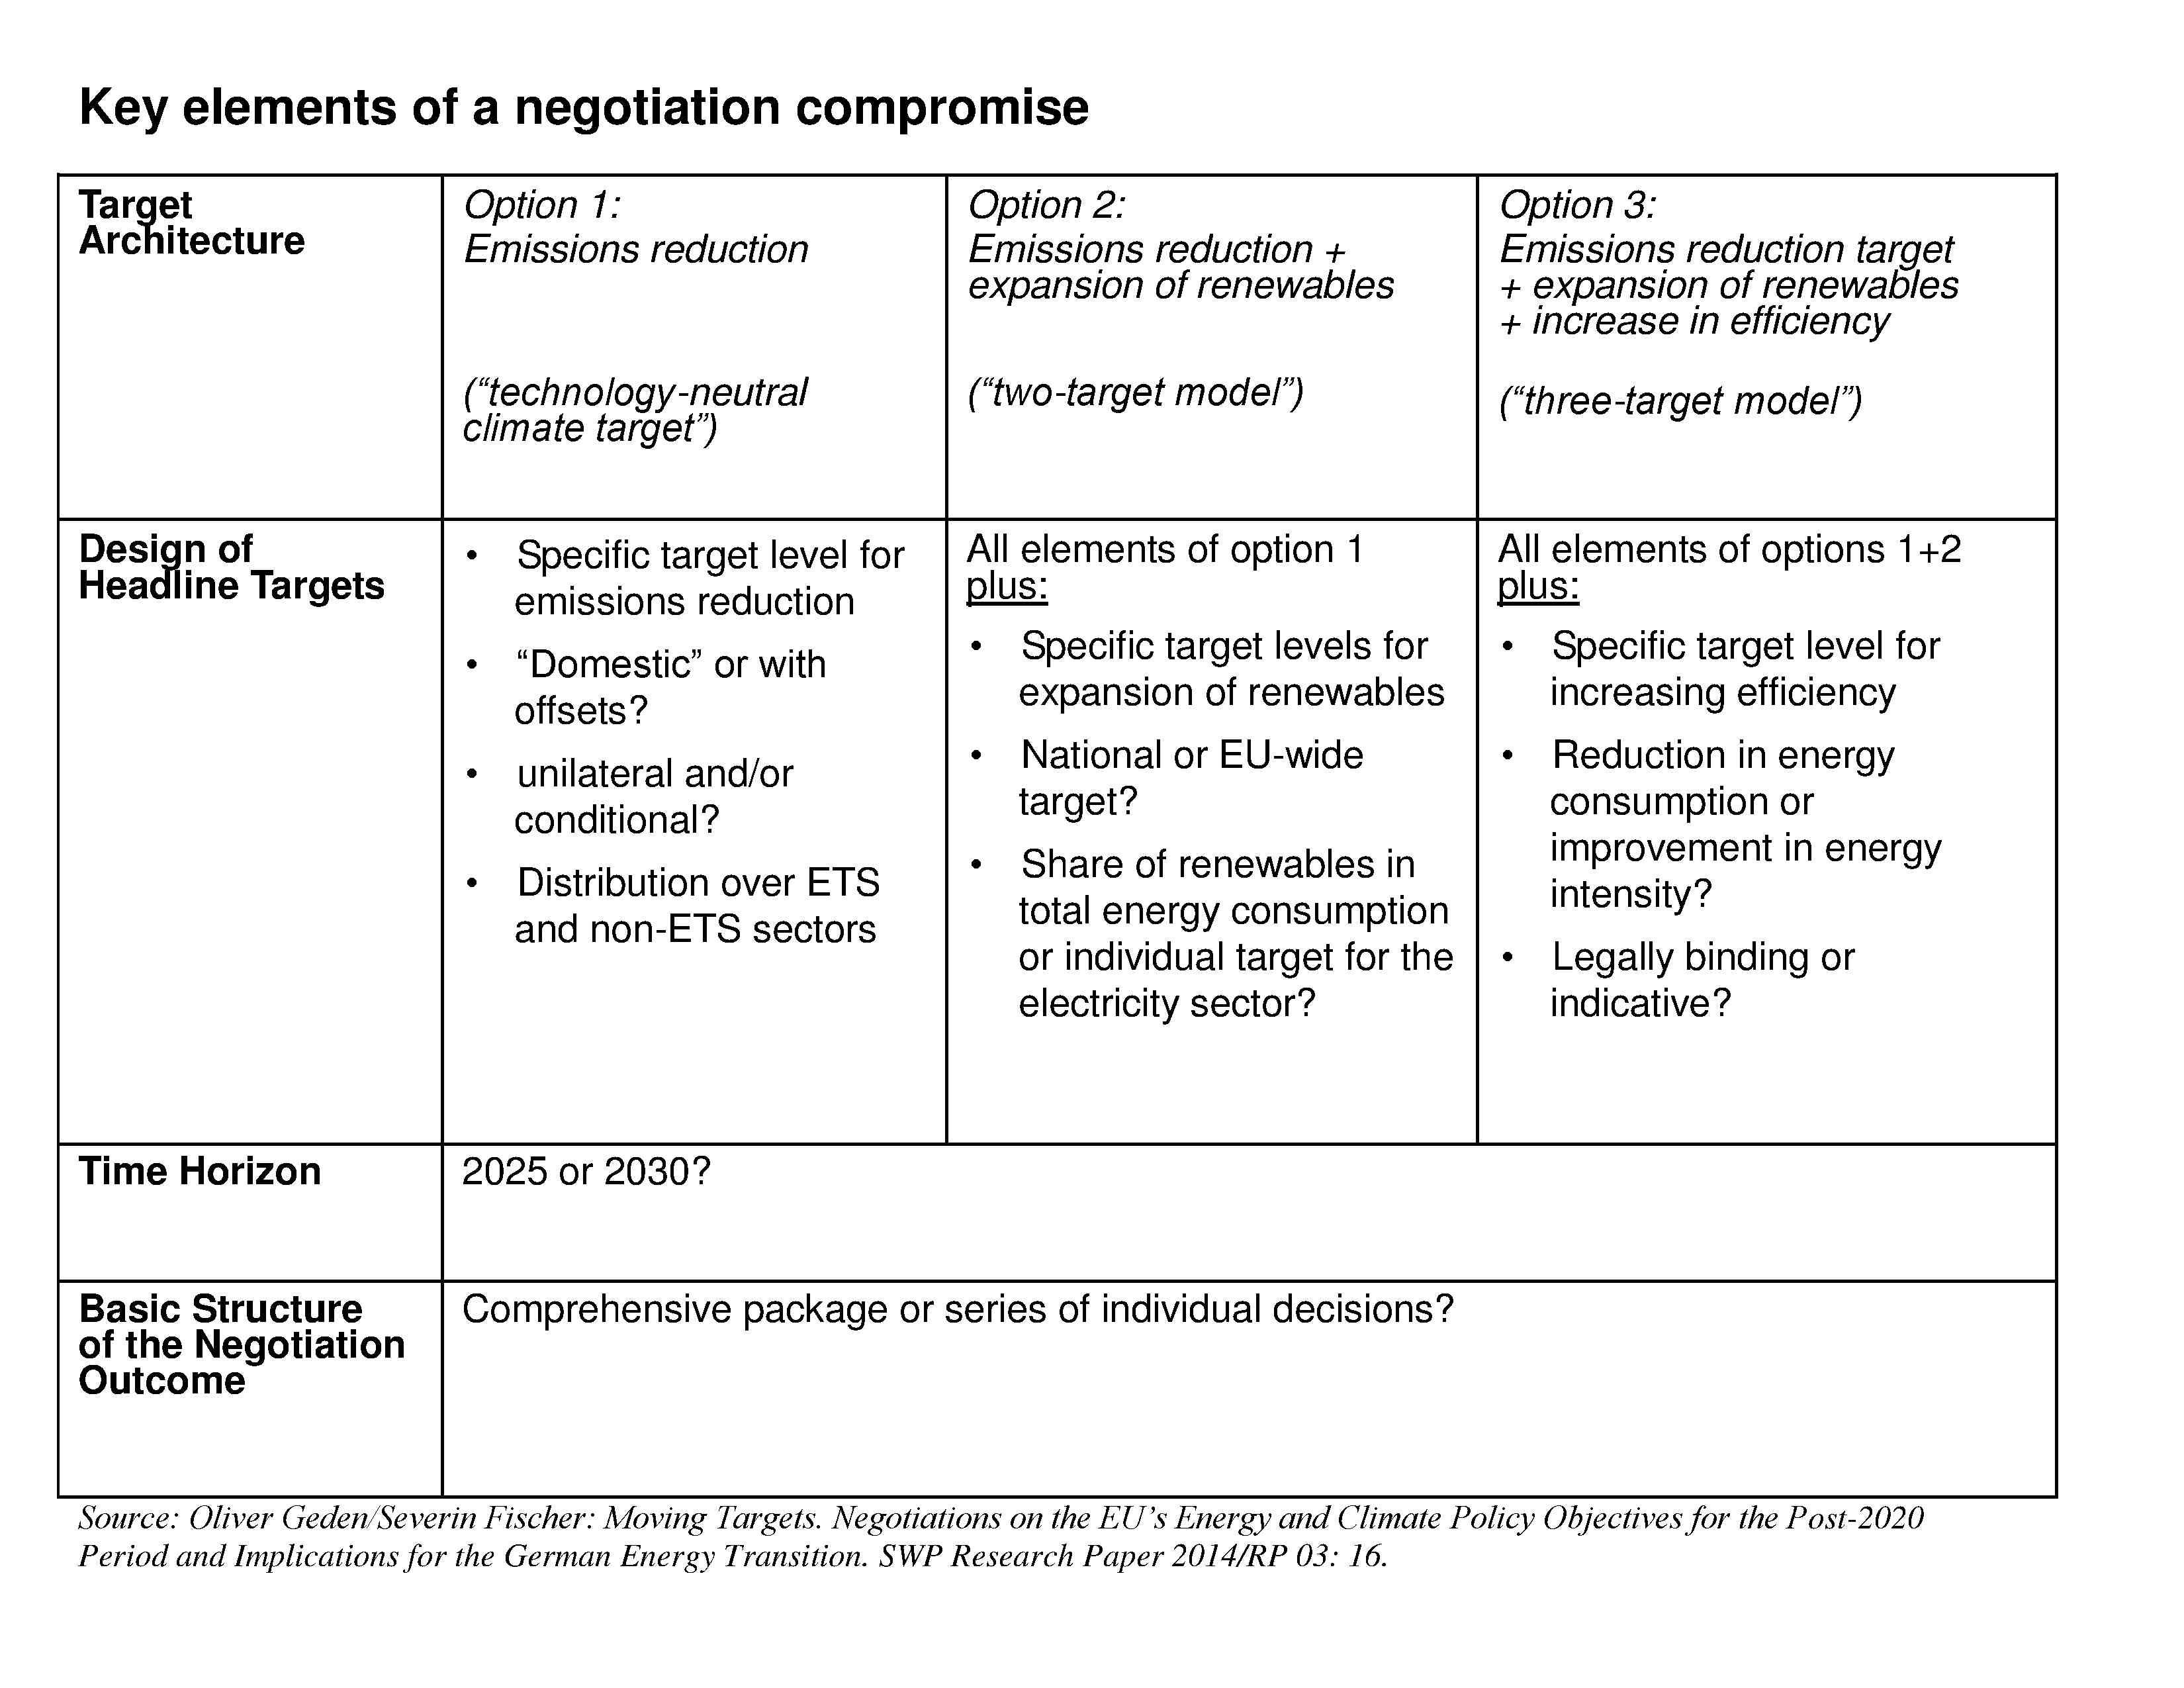 Energiewende Under Siege German Energy Strategy Under